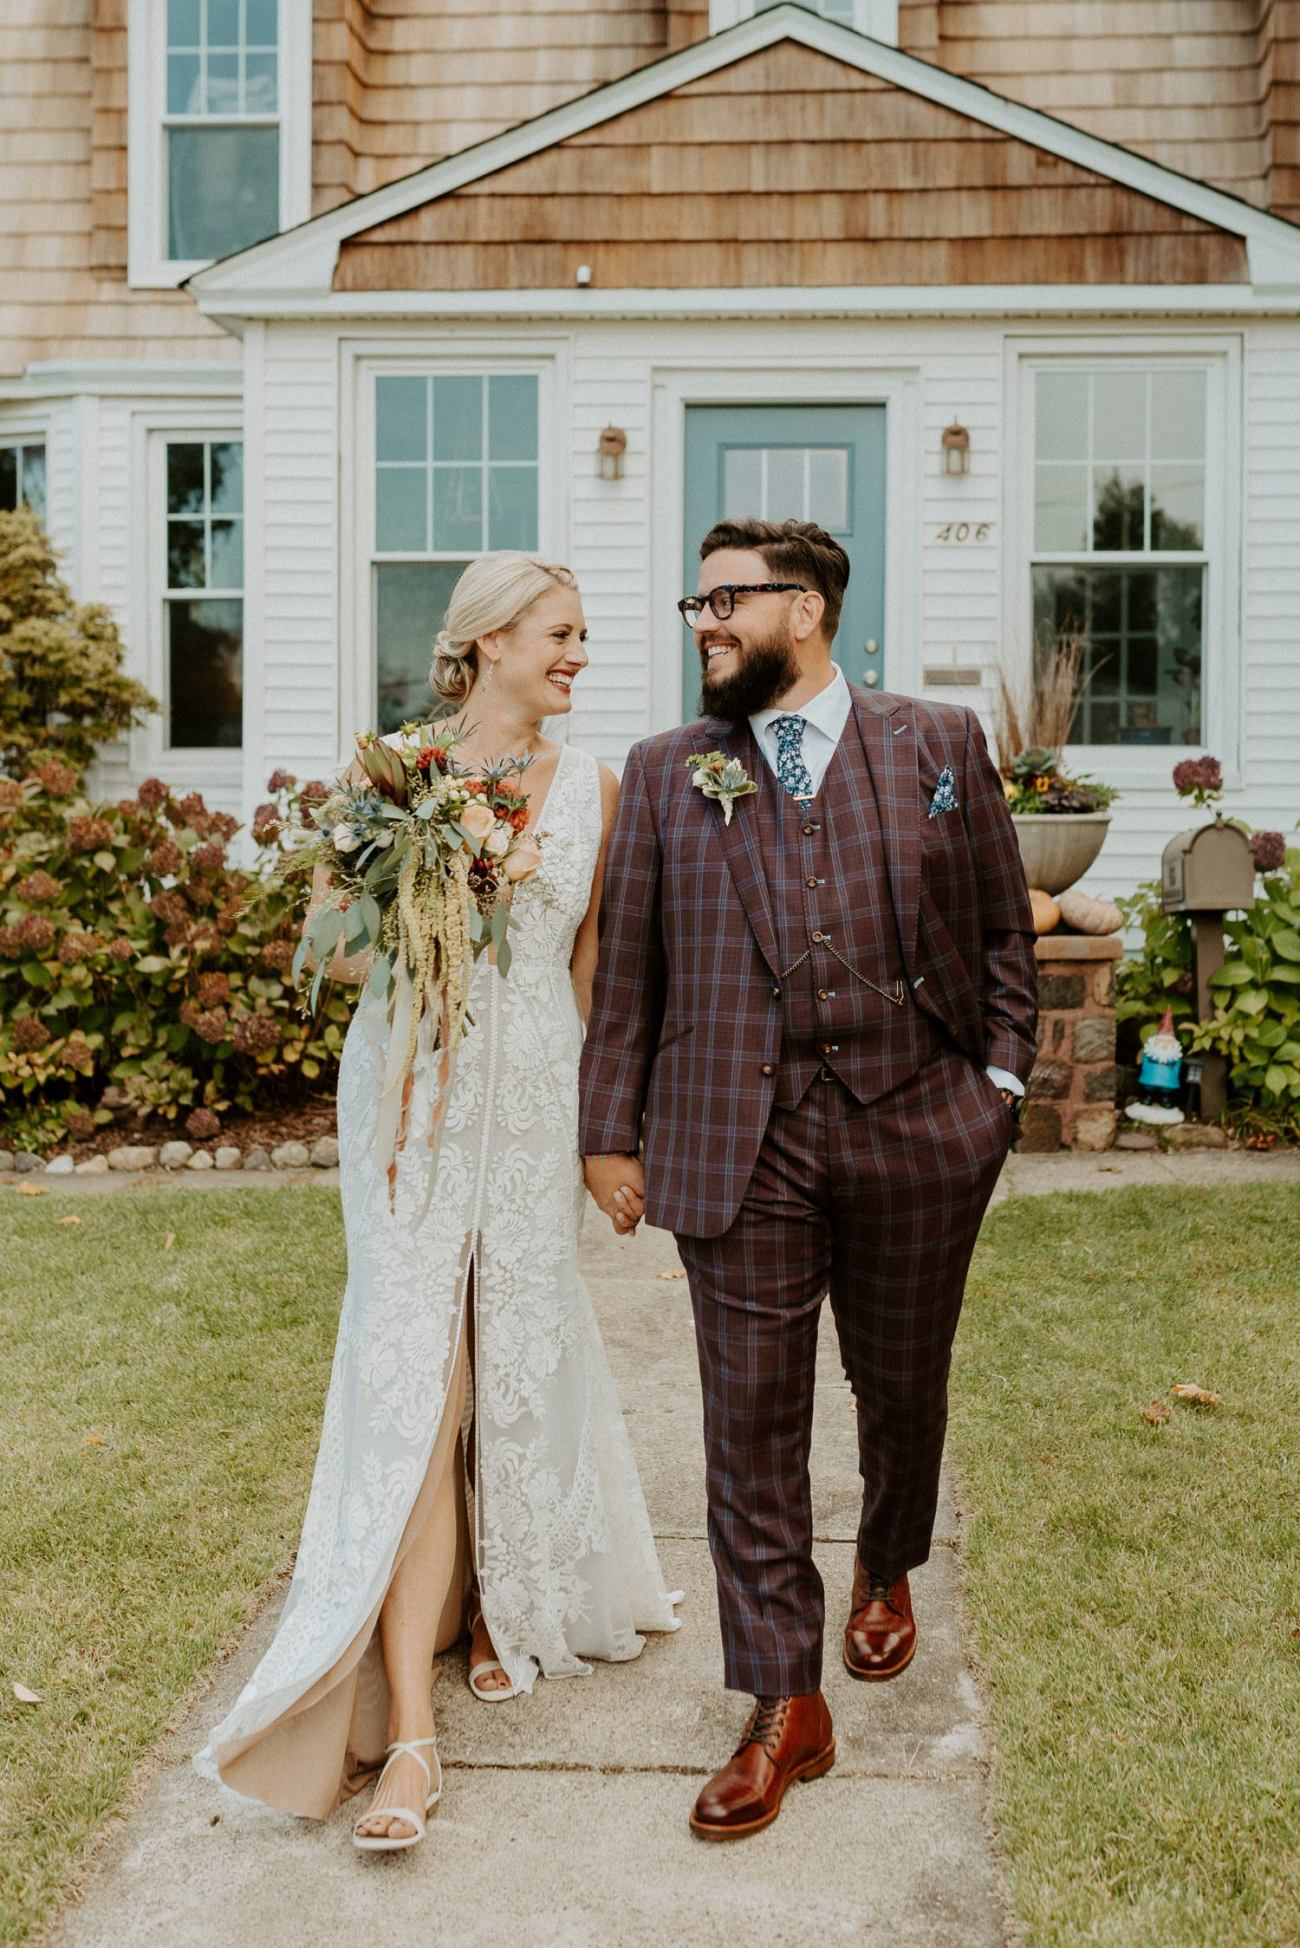 New Jersey Fall Backyard Wedding Bend Wedding Photographer NJ Wedding Photographer Anais Possamai Photography 009